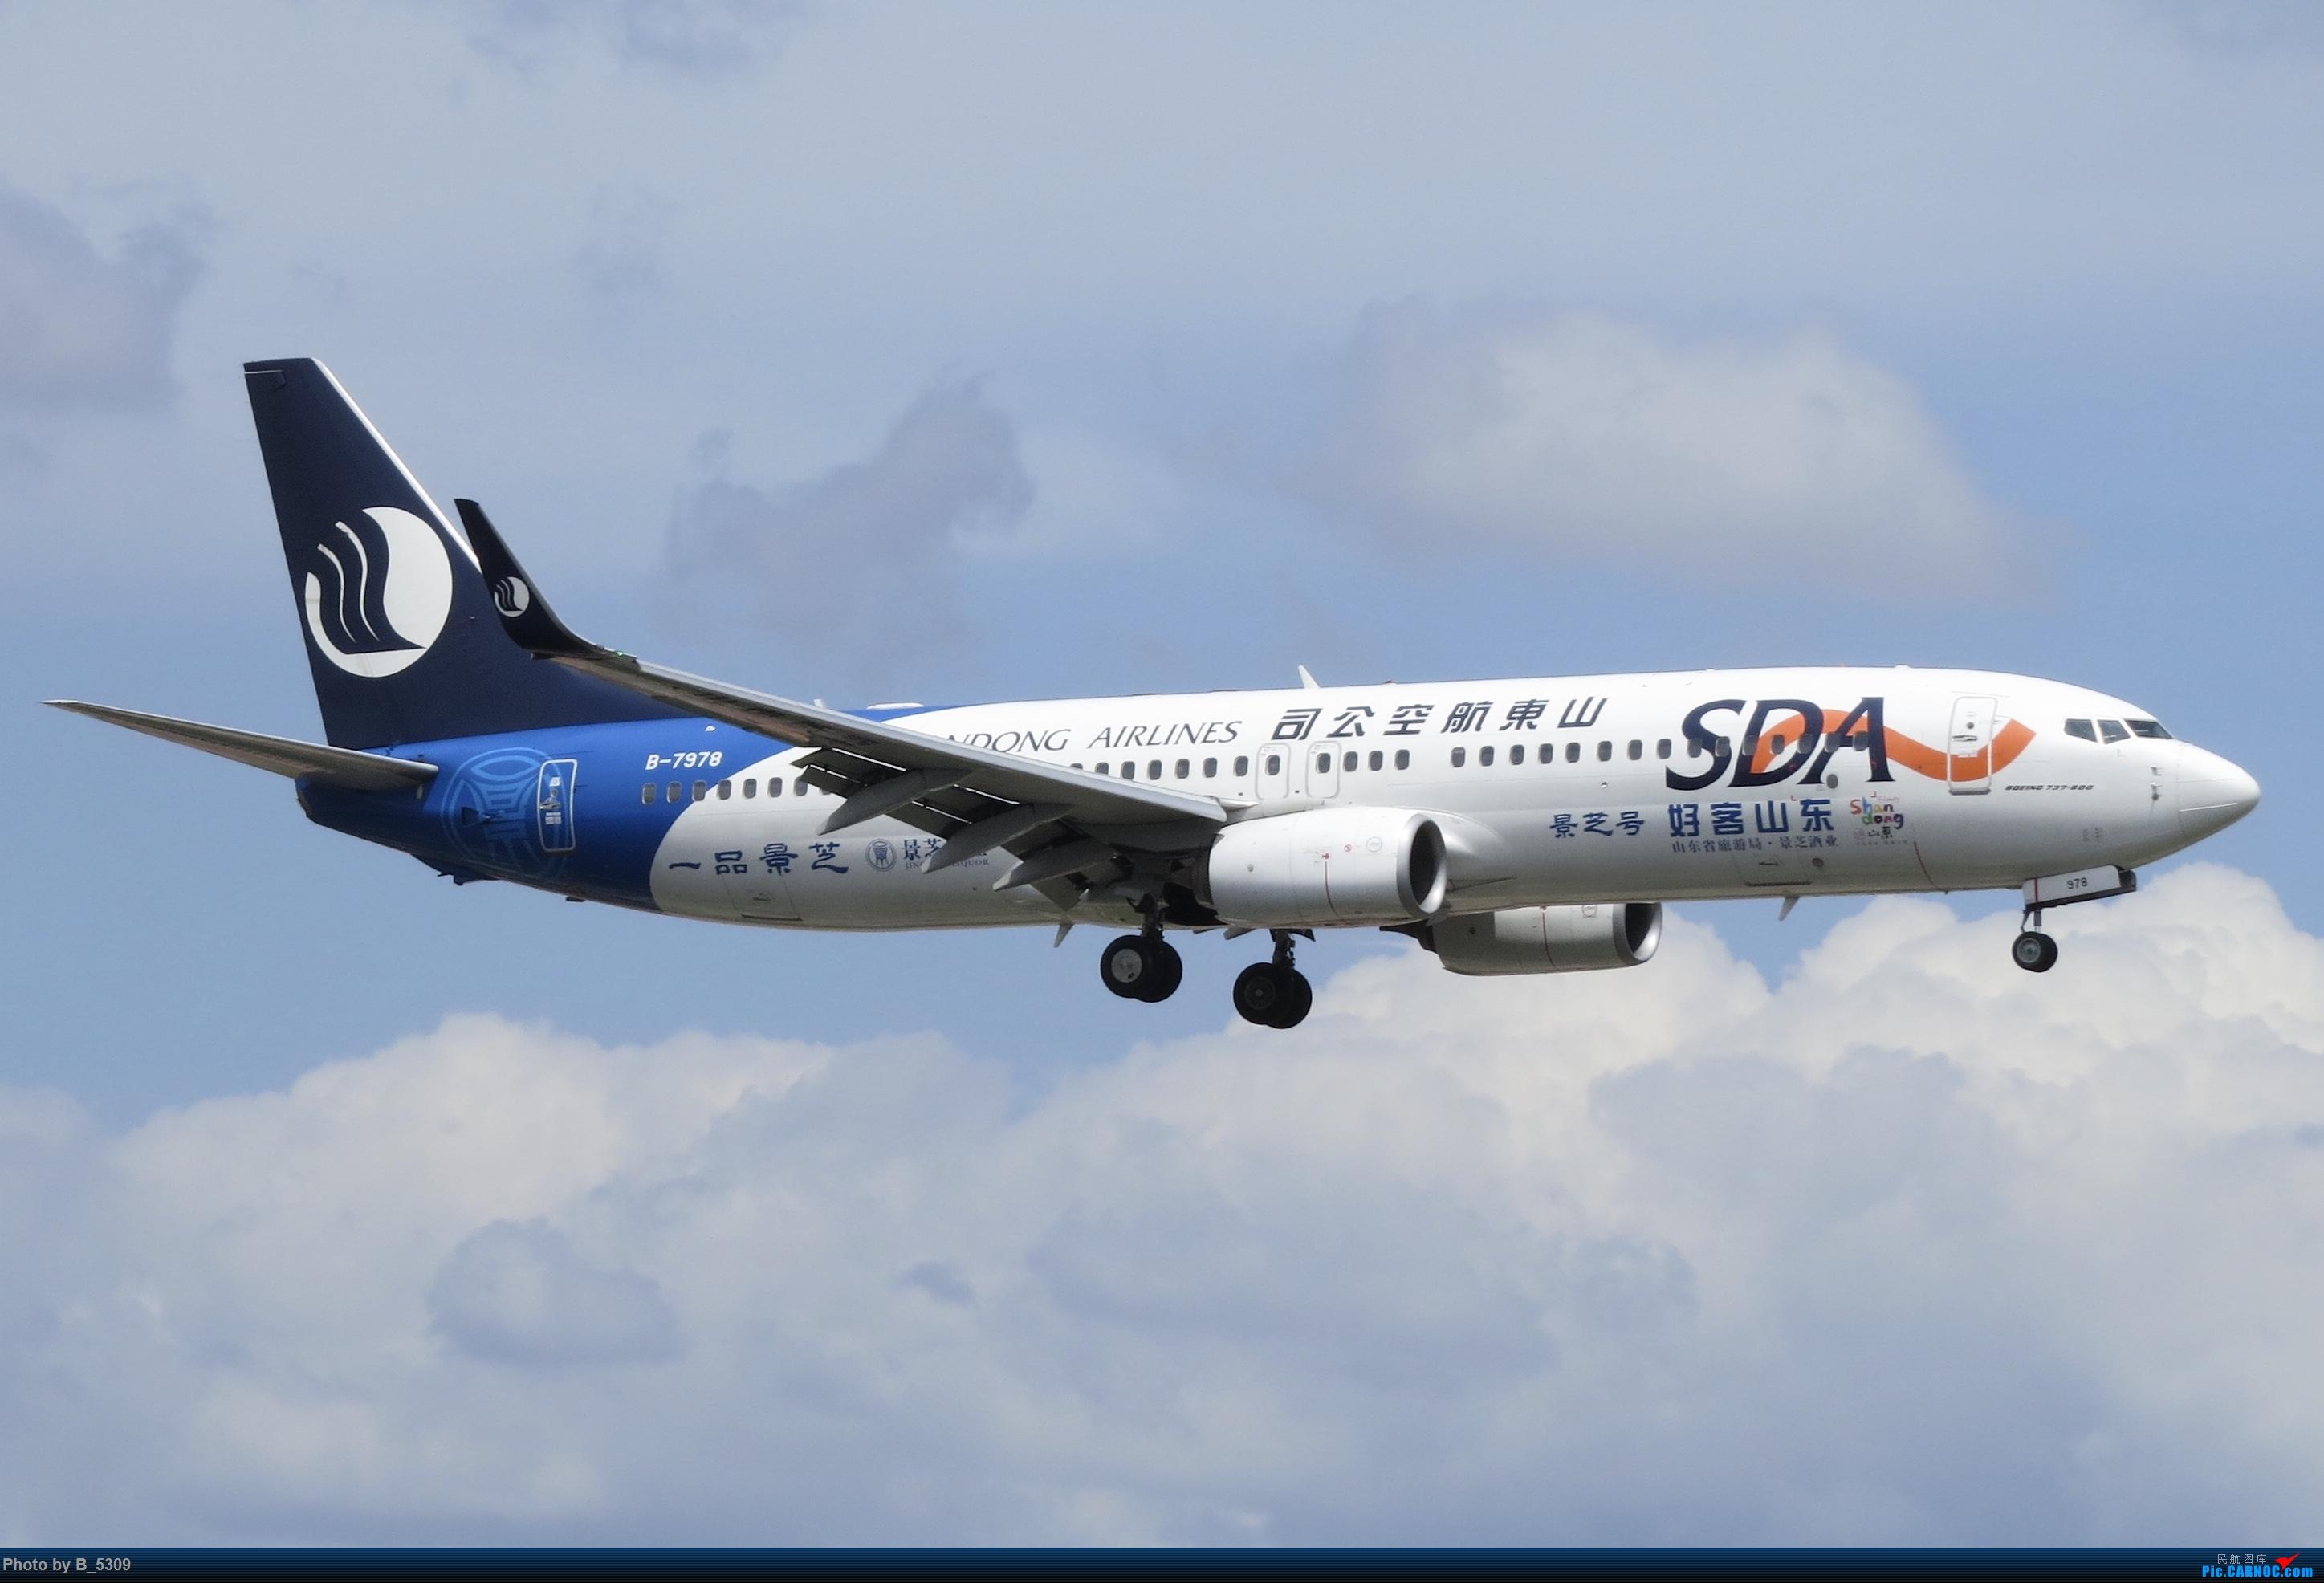 Re:[原创]白鹭窝终于换向了。。。 BOEING 737-800 B-7978 中国厦门高崎国际机场